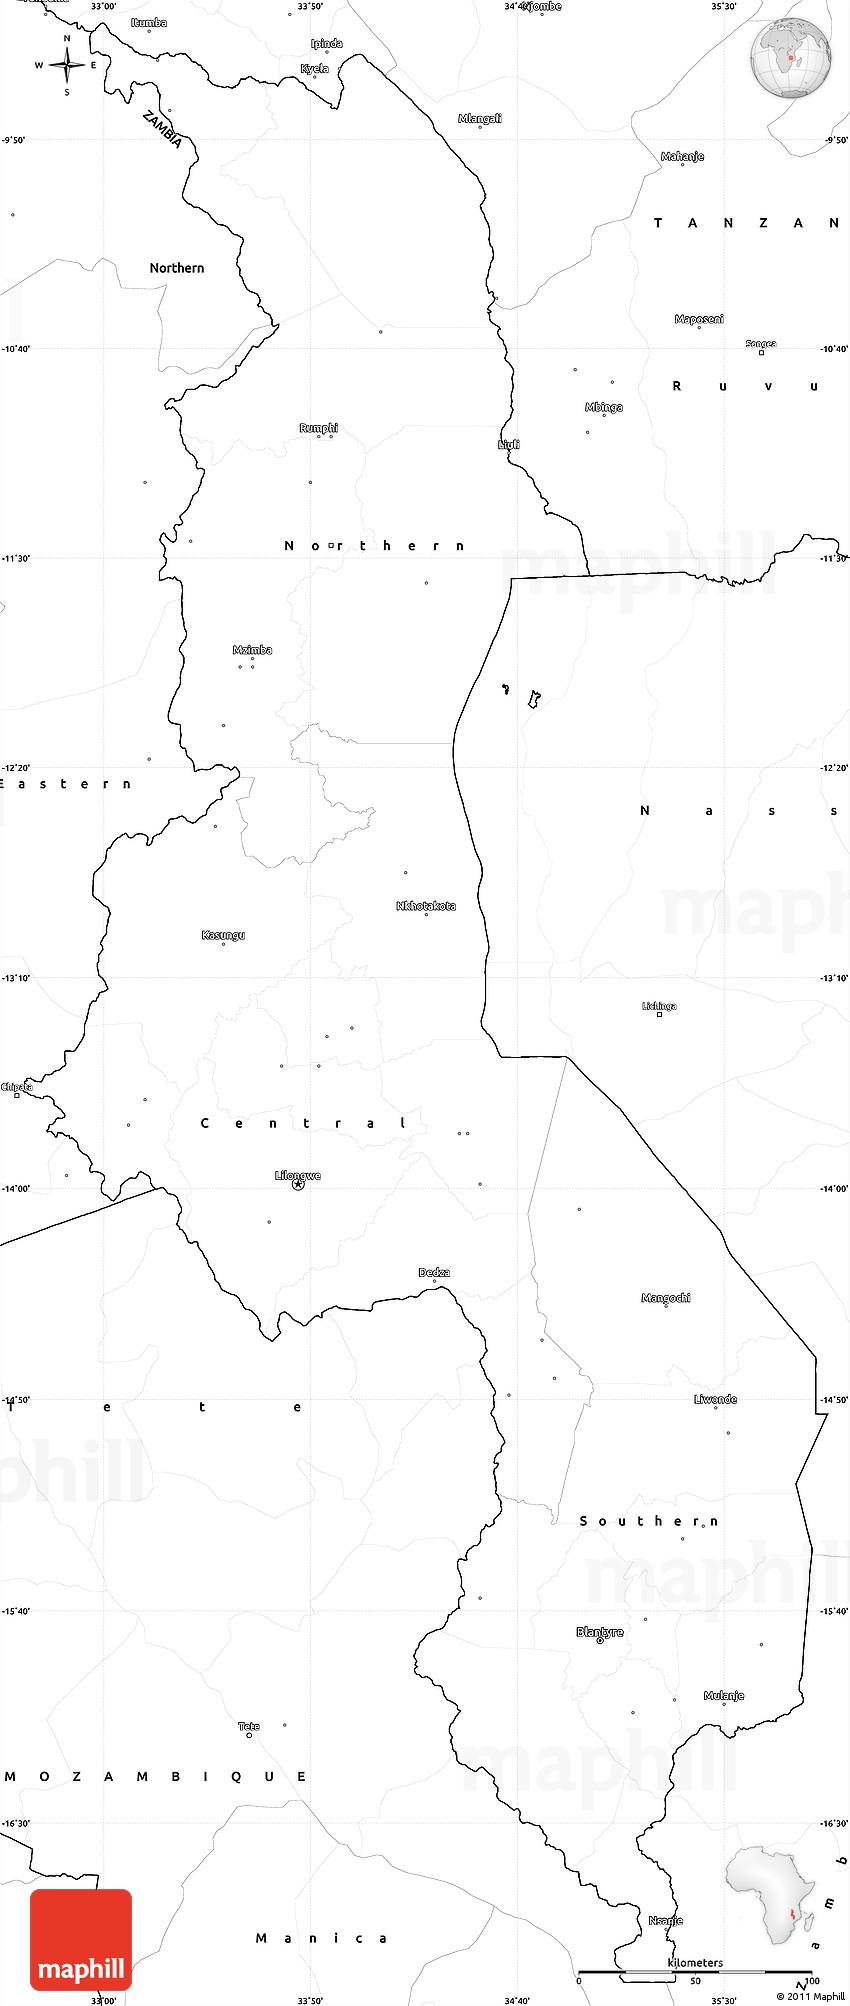 Blank Simple Map Of Malawi - Malawi blank map